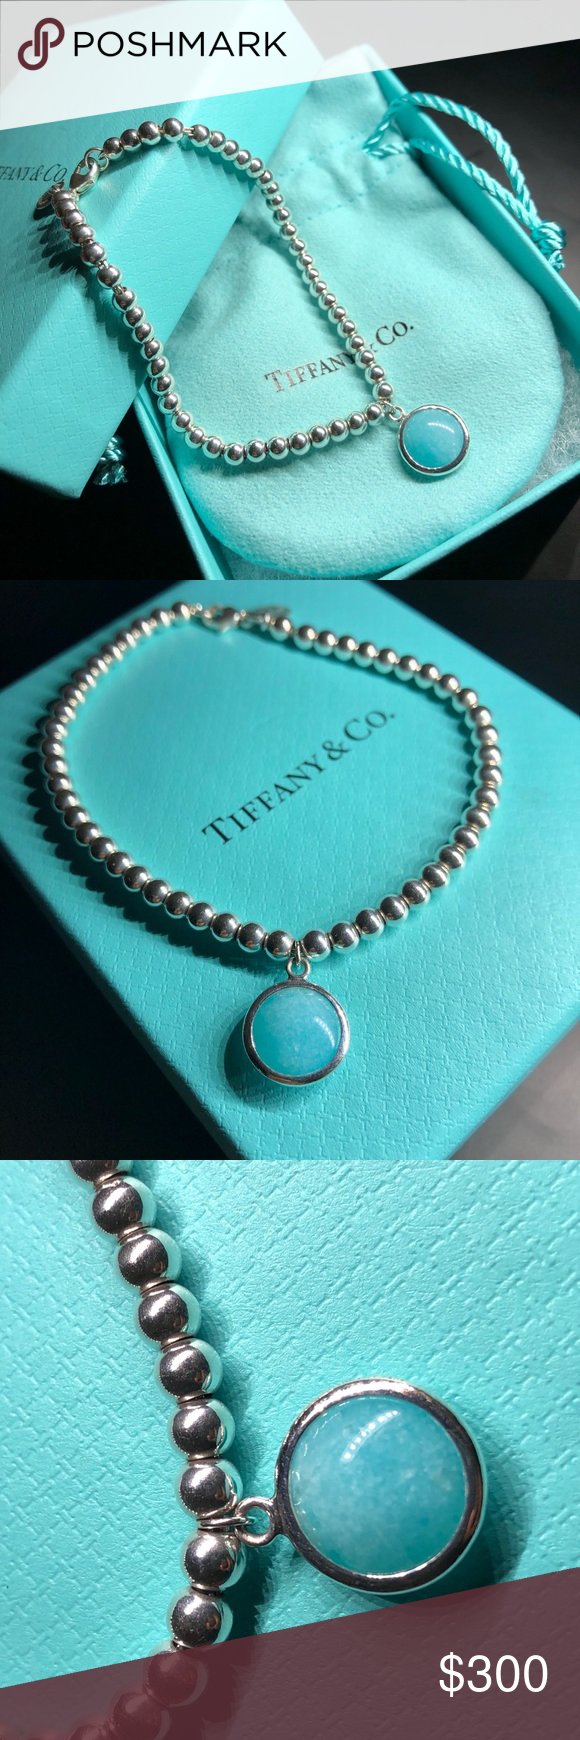 e4fcf5a28 Tiffany & Co. Sugar Stacks Amazonite Bracelet Tiffany & Co. sterling ...